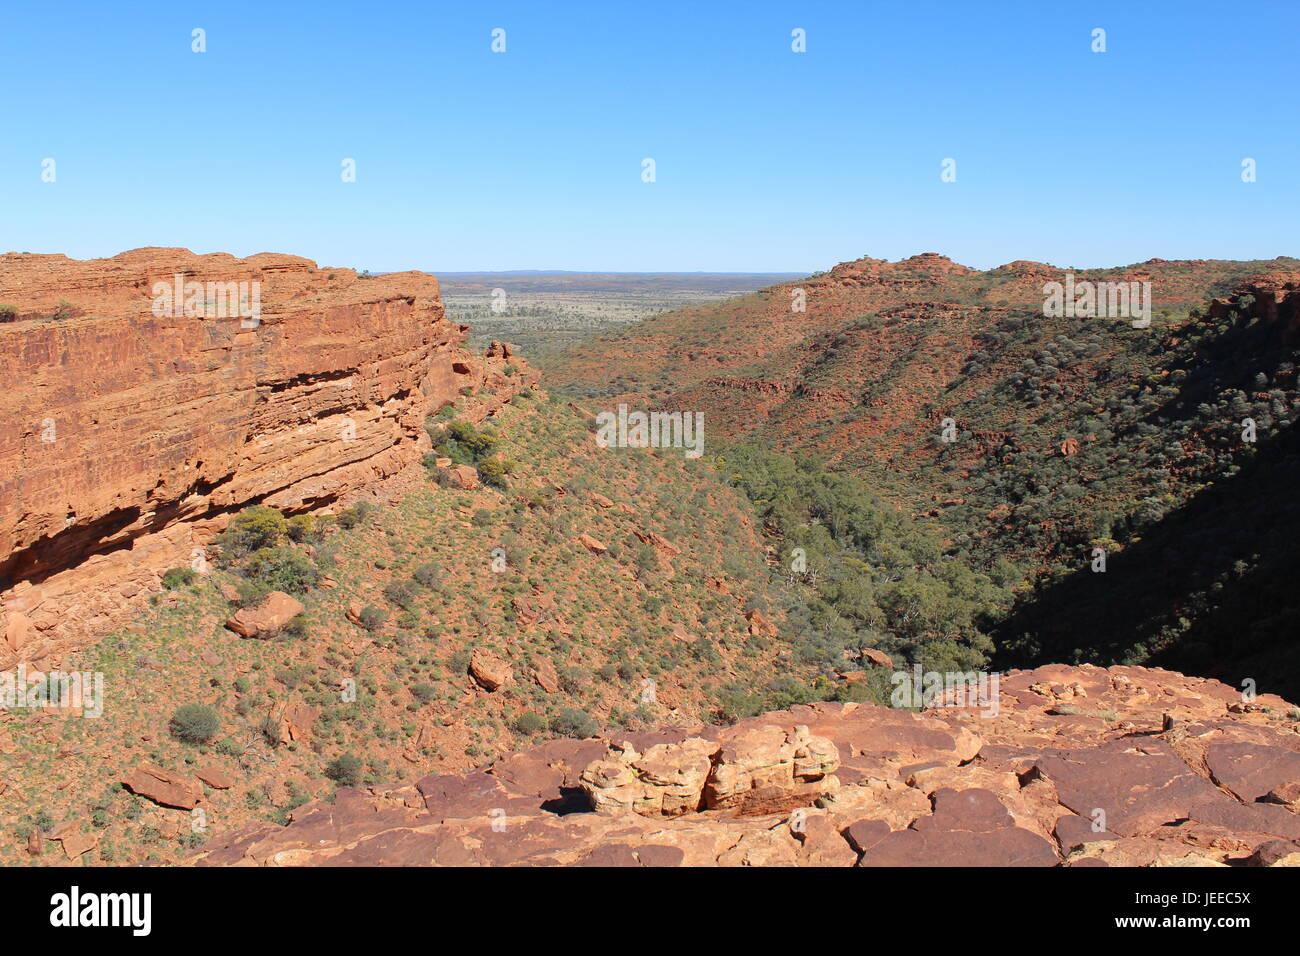 Kings Canyon im Northern Territory von Australien Stockfoto